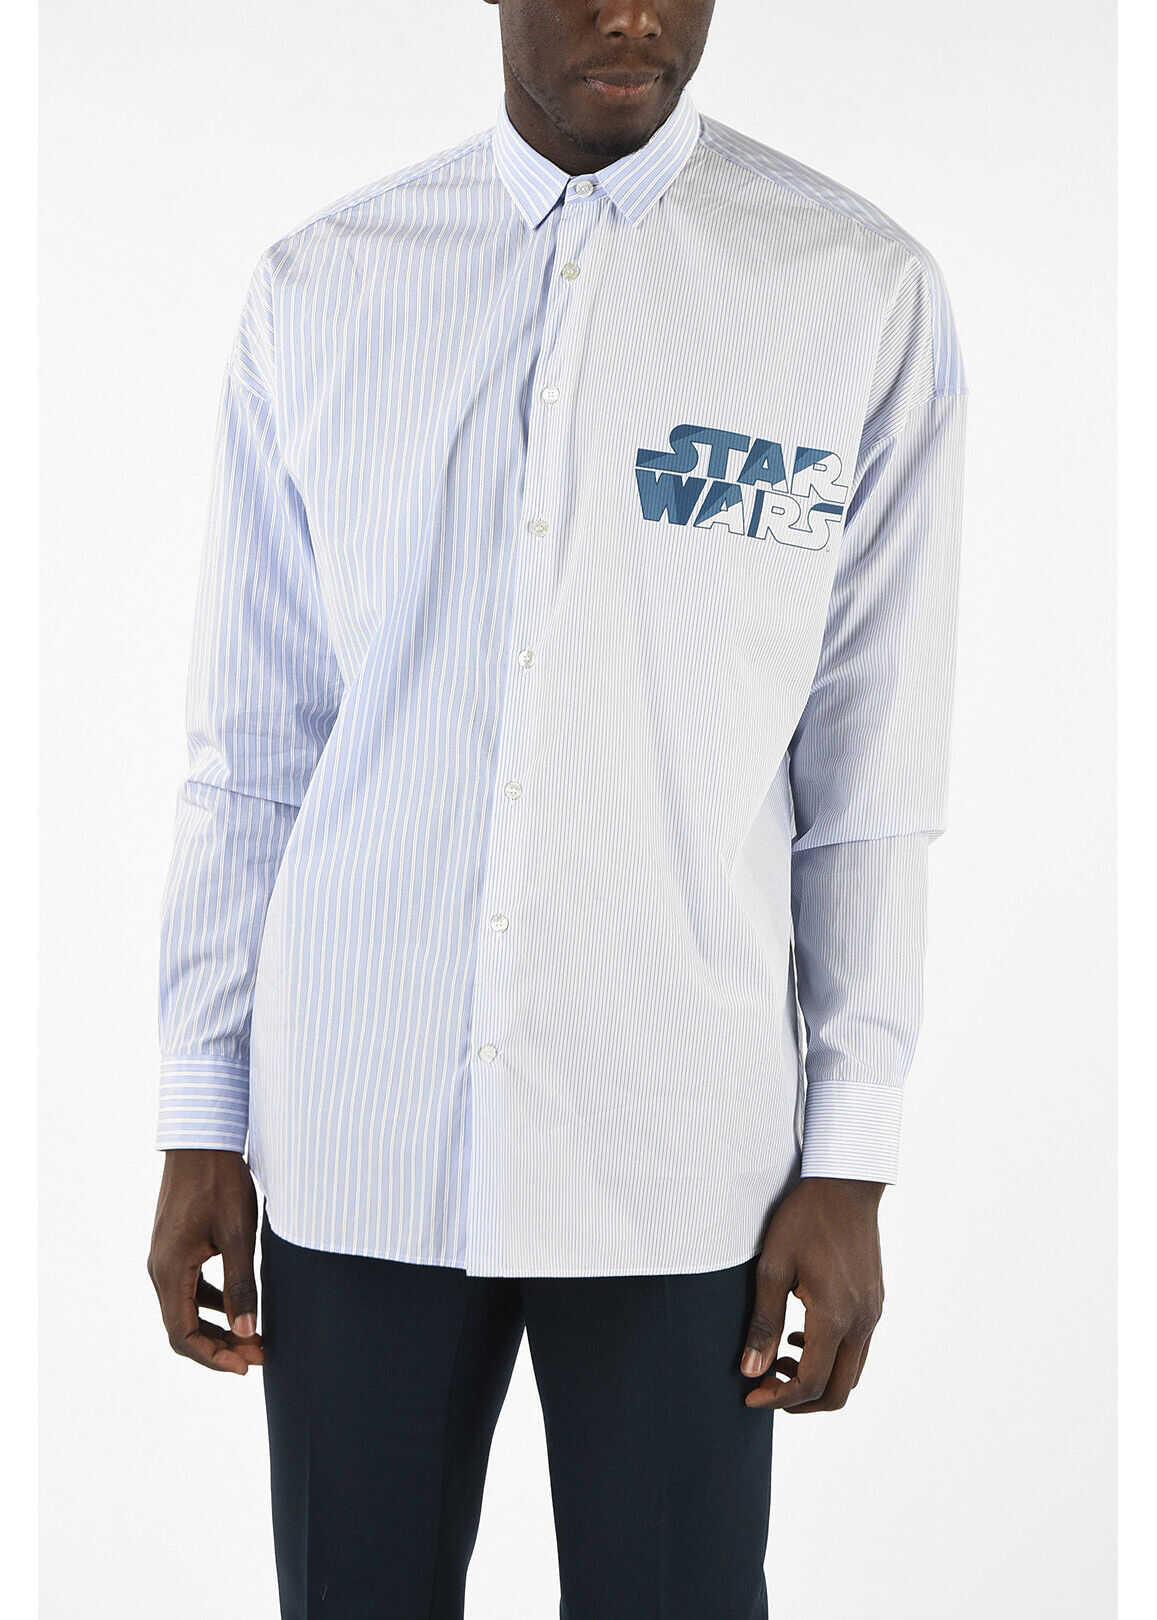 ETRO STAR WARS Bengal Striped Shirt with Print LIGHT BLUE imagine